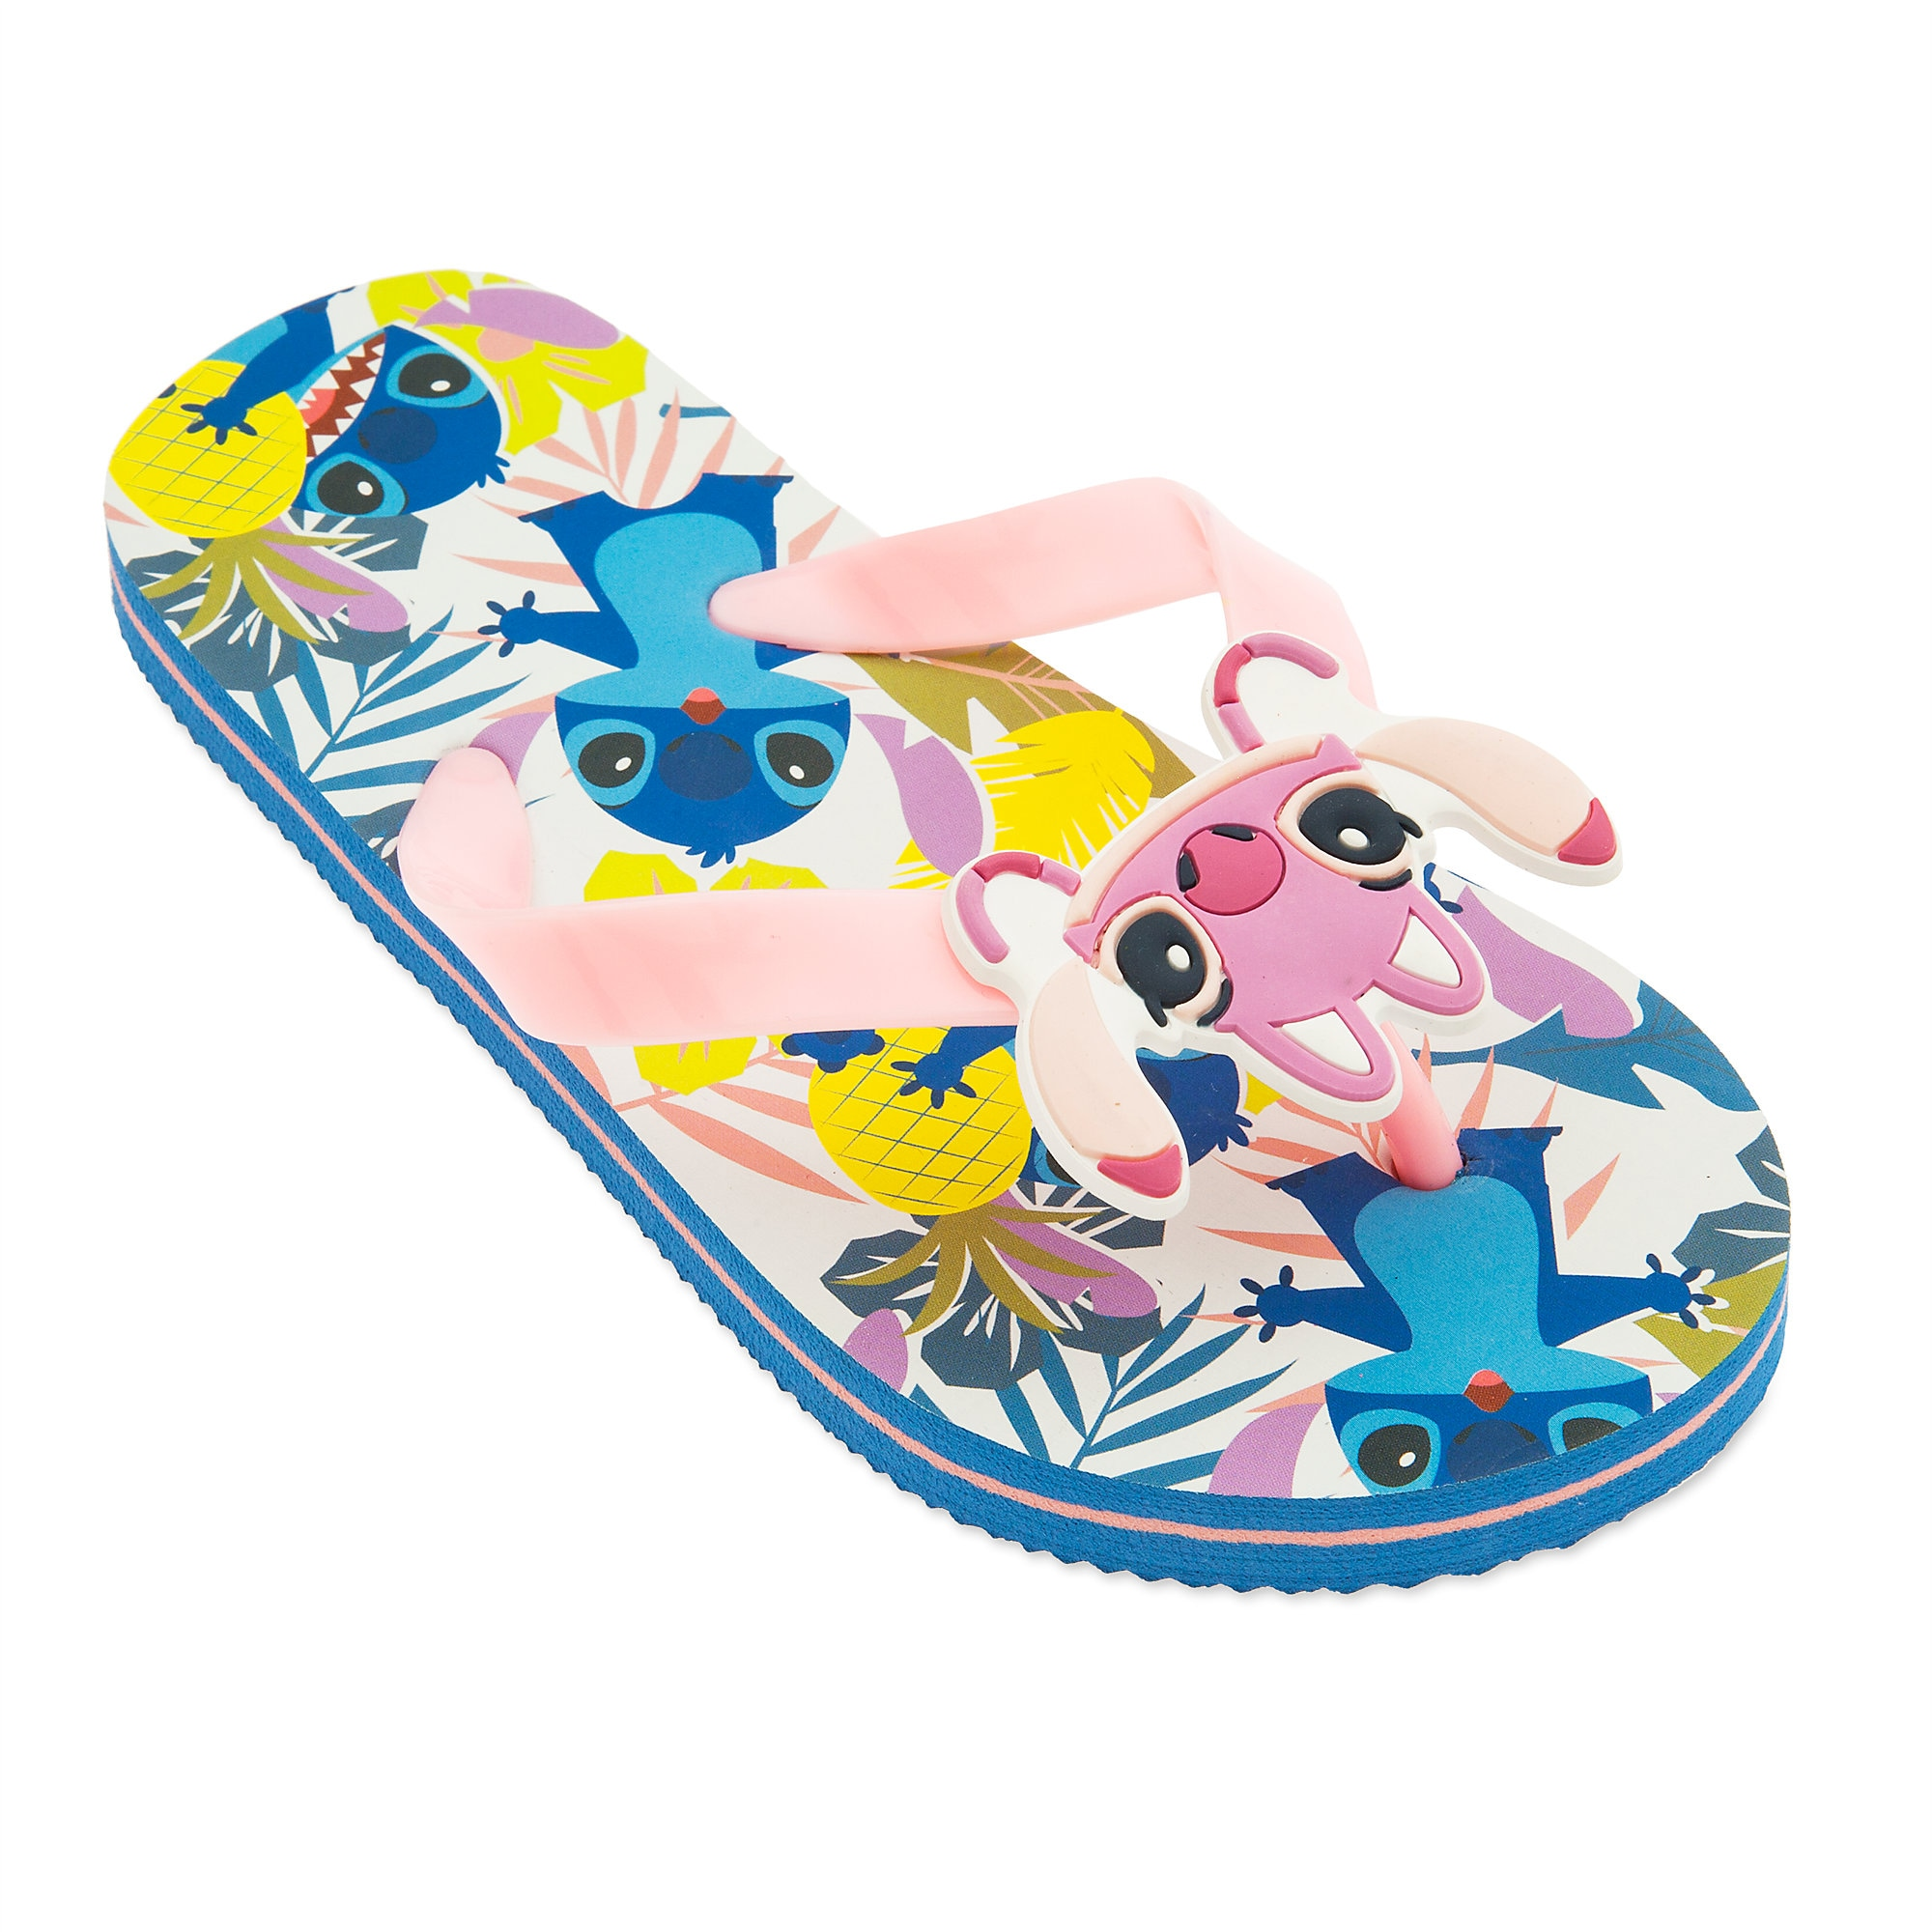 14873873960b NWT Disney Store Ariel Flip Flops Sandals Shoes Girls Little Mermaid many  sizes. Disney Minnie Mouse ...